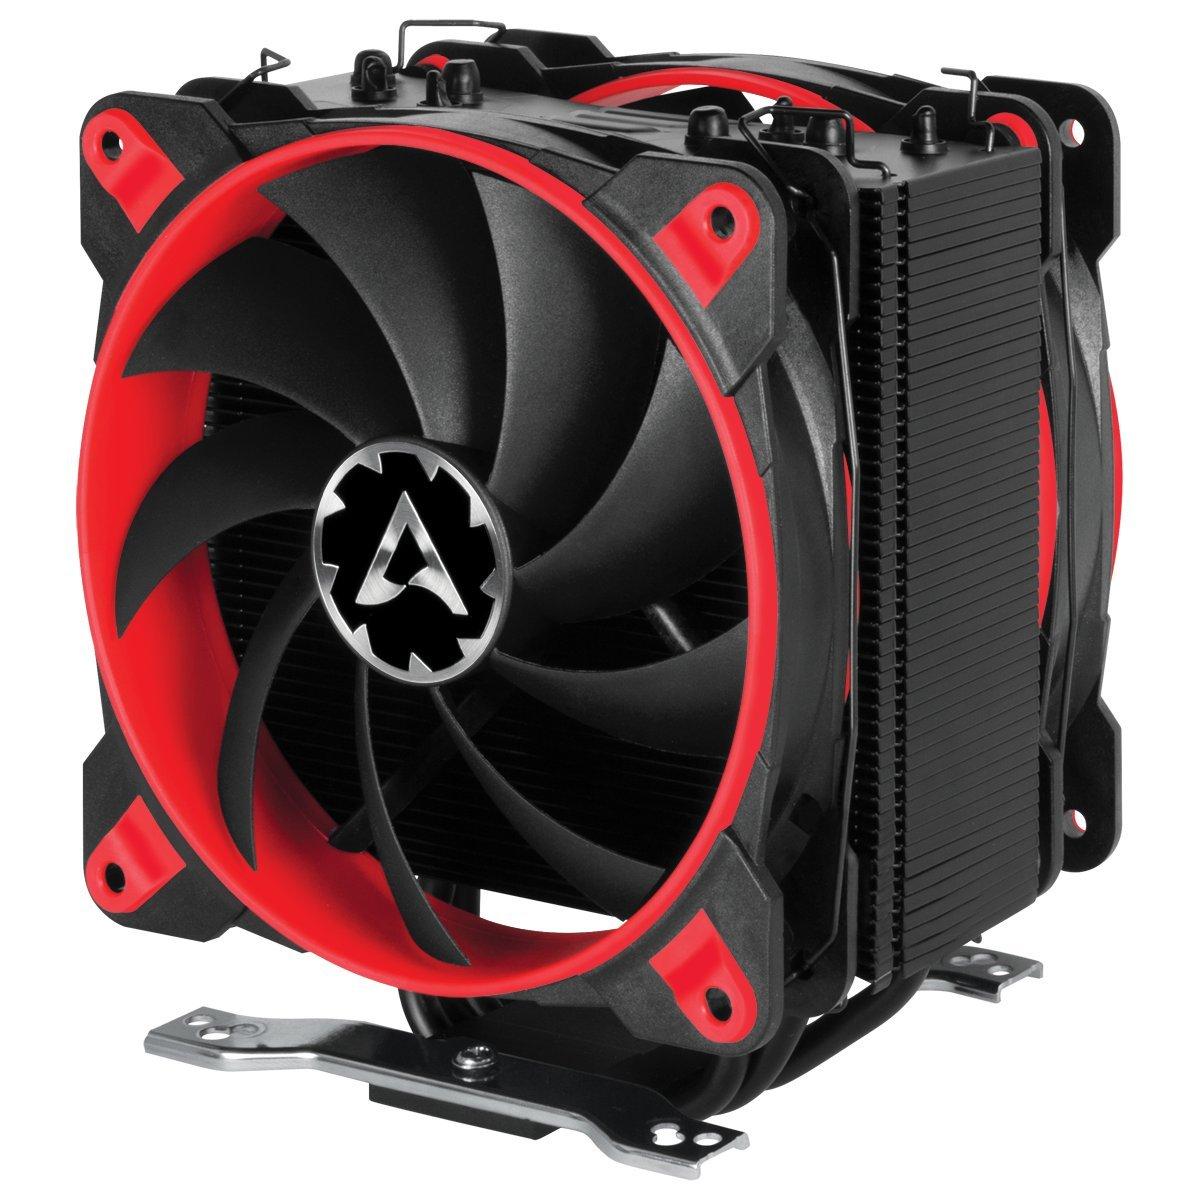 Arctic Freezer 33 Esports Edition - Ventilador para Caja de Ordenador I 2 Ventiladores de 120 mm I 200 a 1 800 RPM I Muy silencioso - Rojo: Amazon.es: Informática